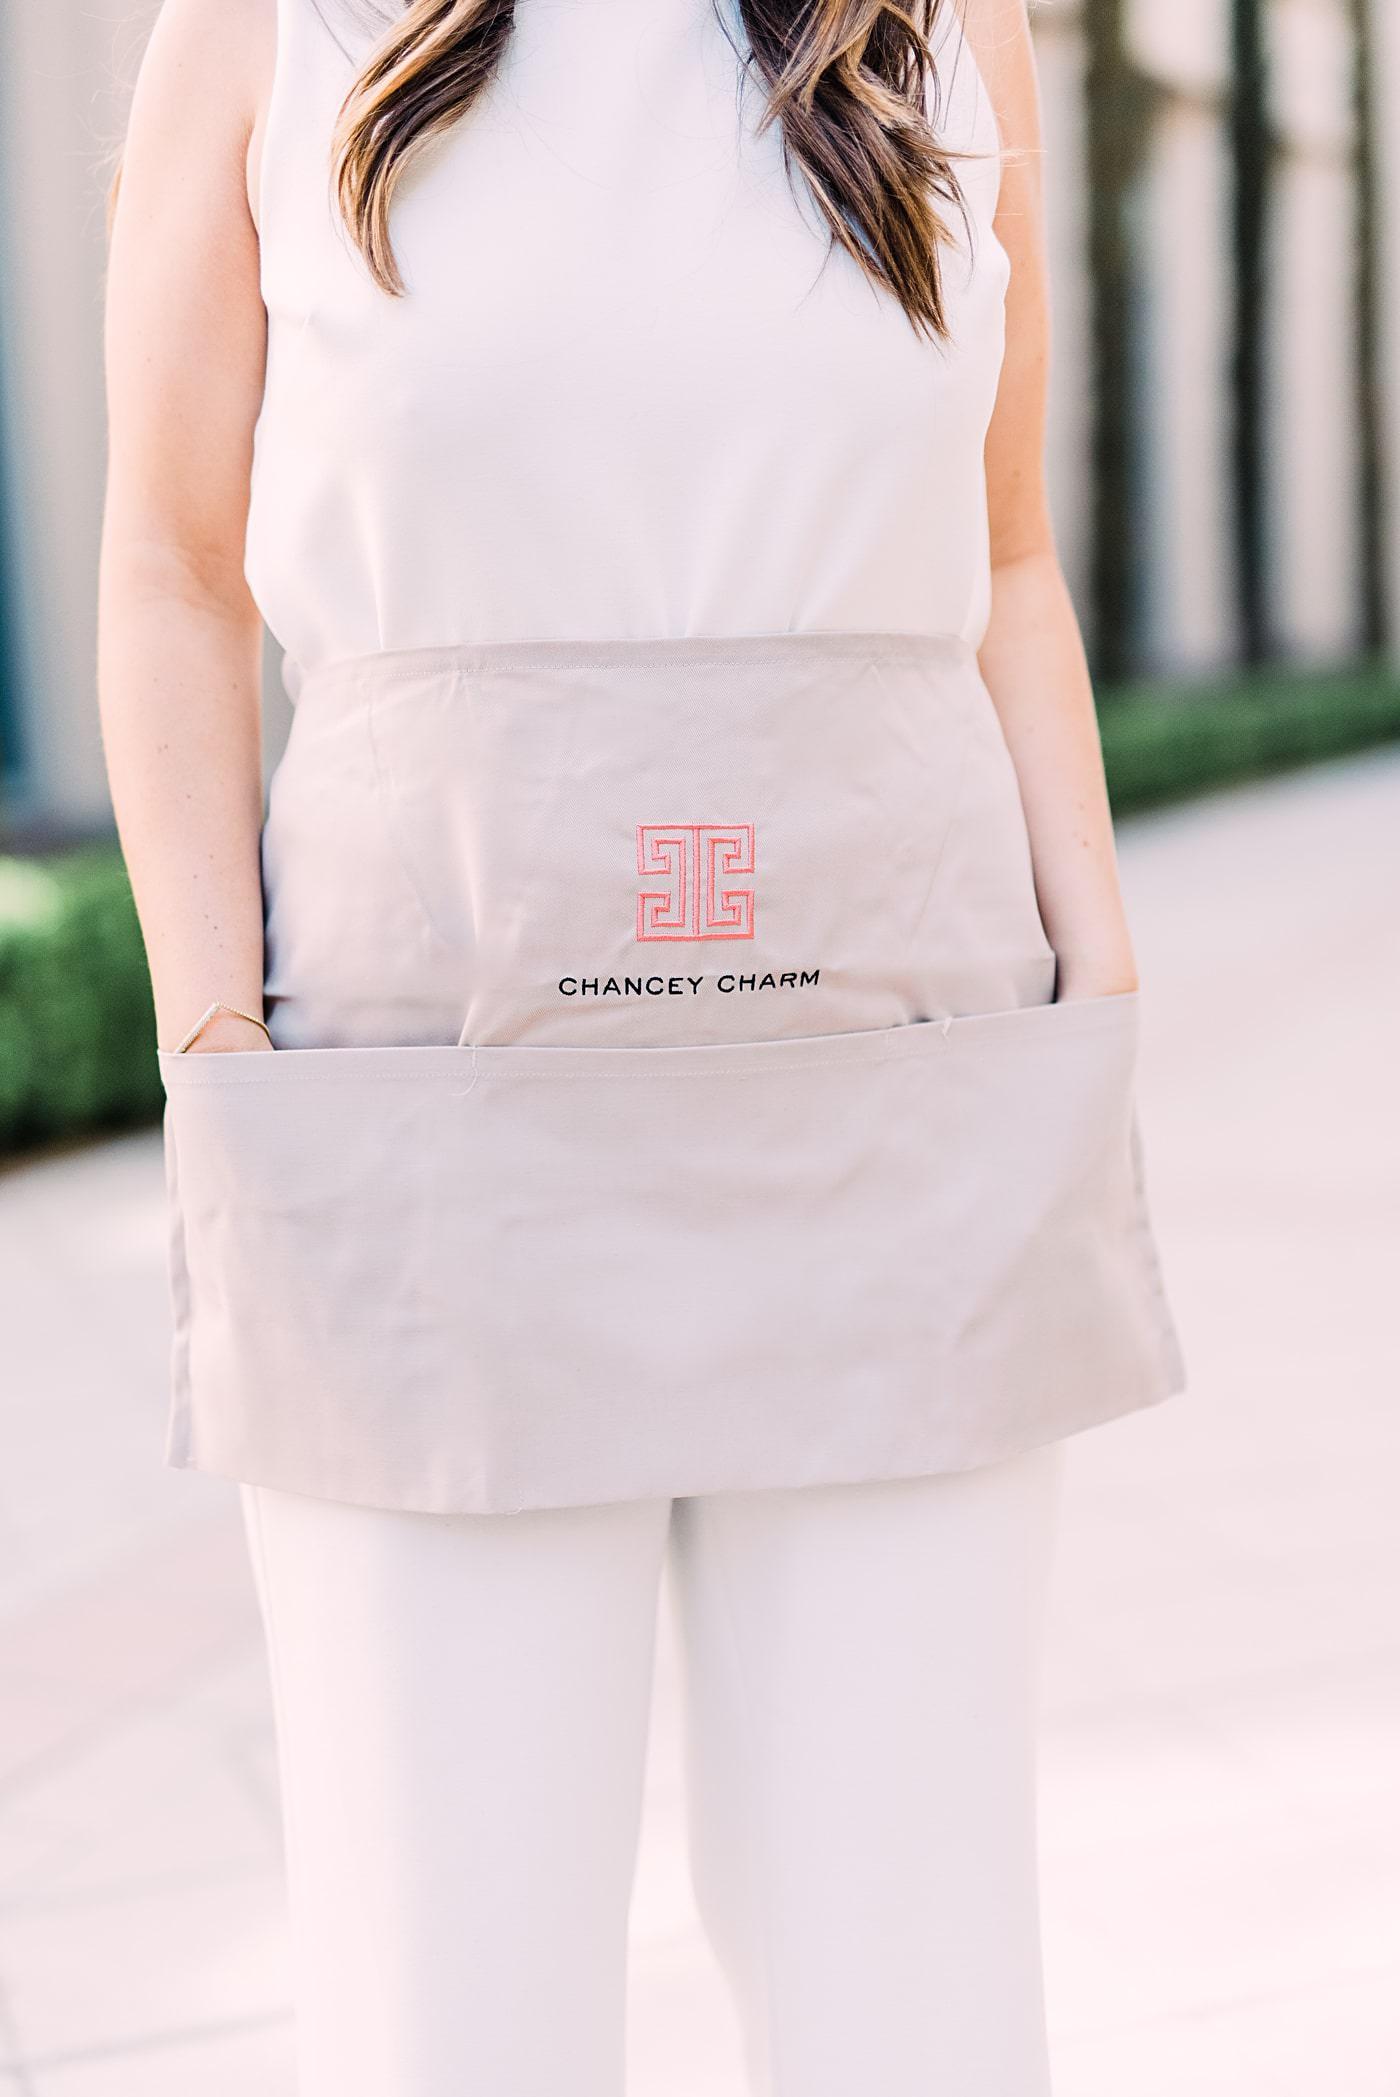 chancey-charm-wedding-planner-apron